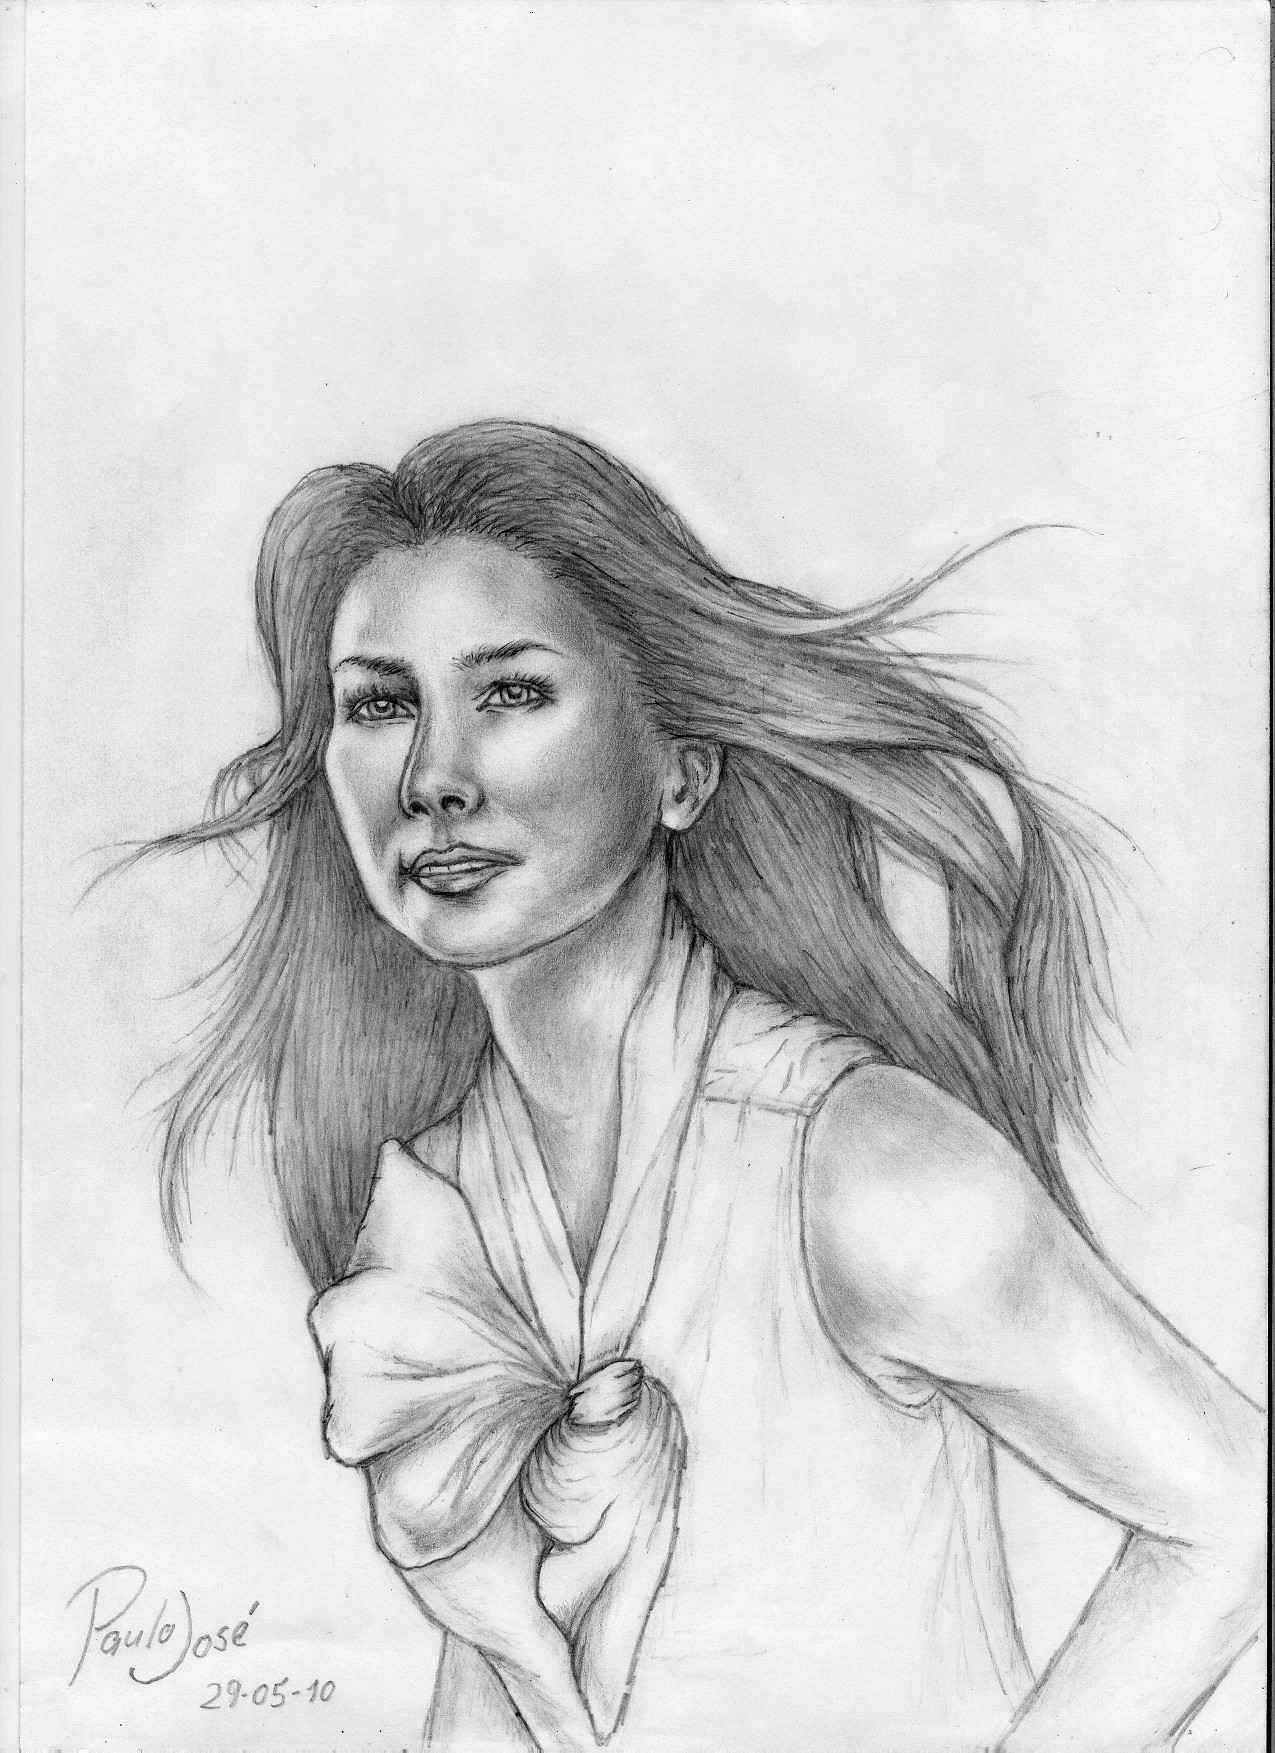 Shania Twain 2010 by pauloup